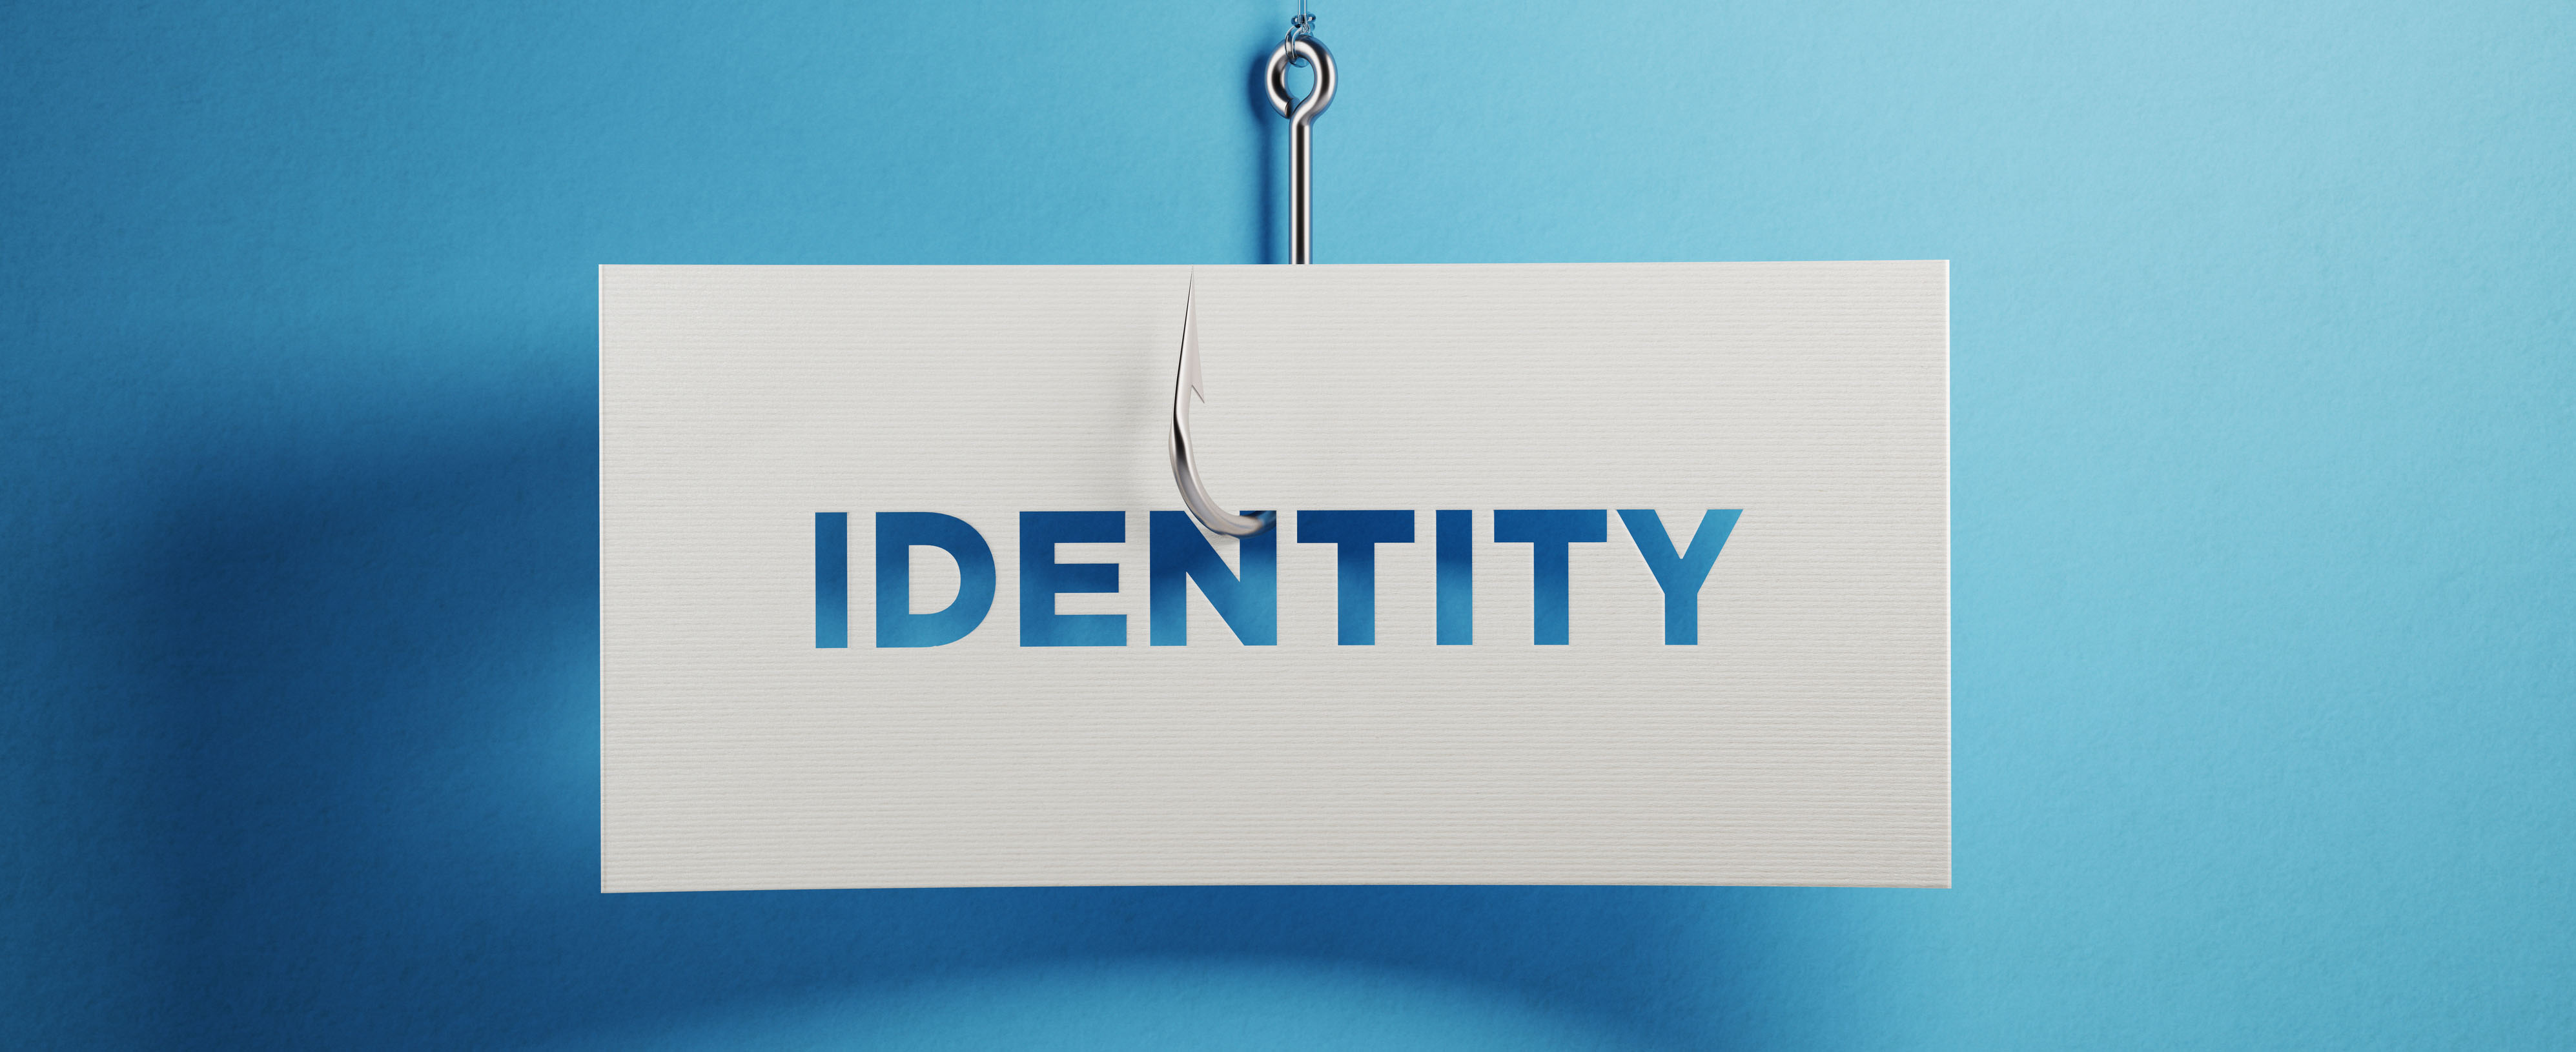 New IRS Identity Theft Website